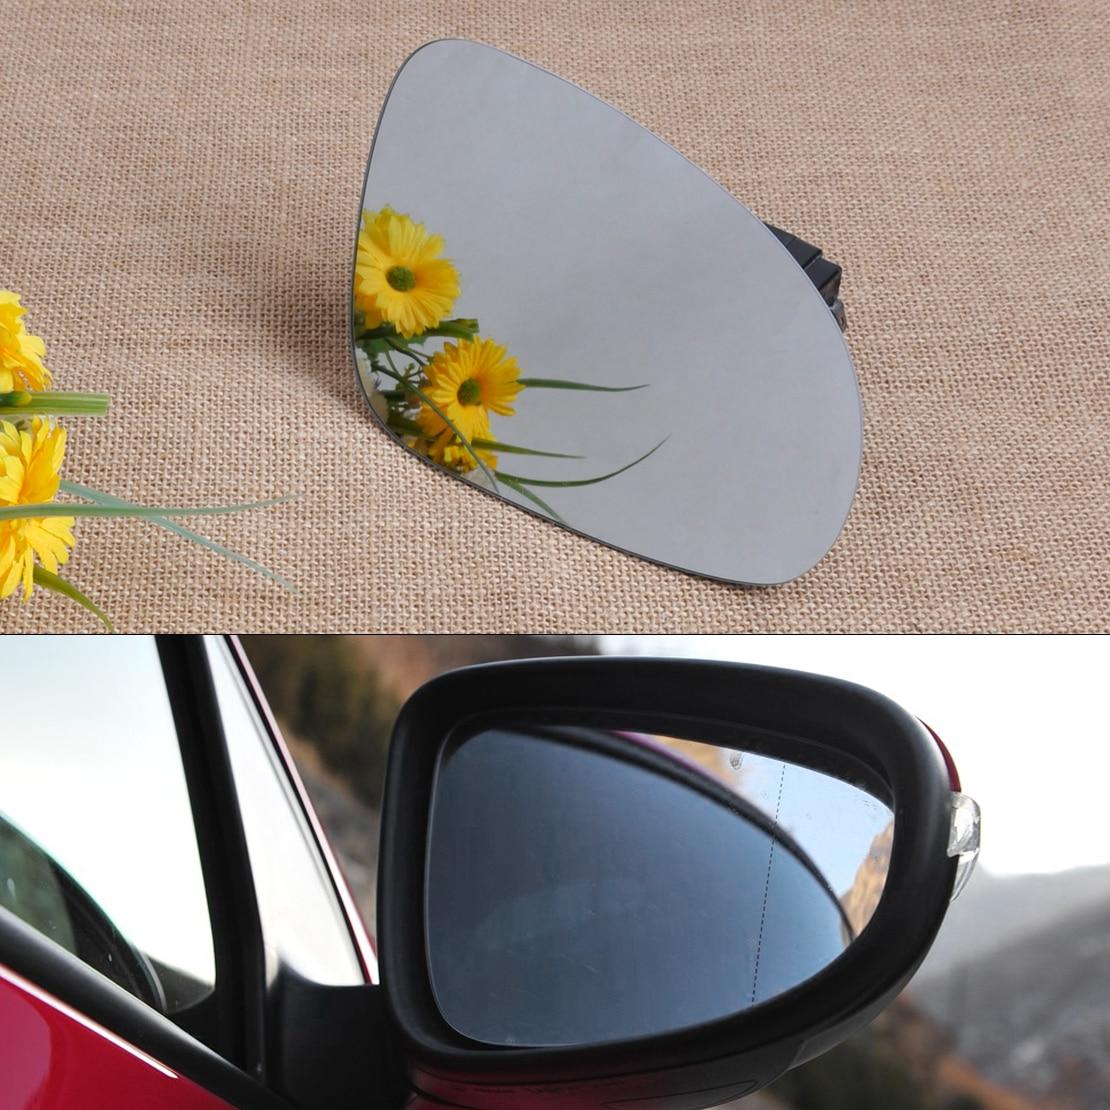 beler for Volkswagen VW Golf GTI Jetta MK5 EOS R32 Rabbit Passat B6 Car Right Side Wing Mirror Glass Heat W/ Holder